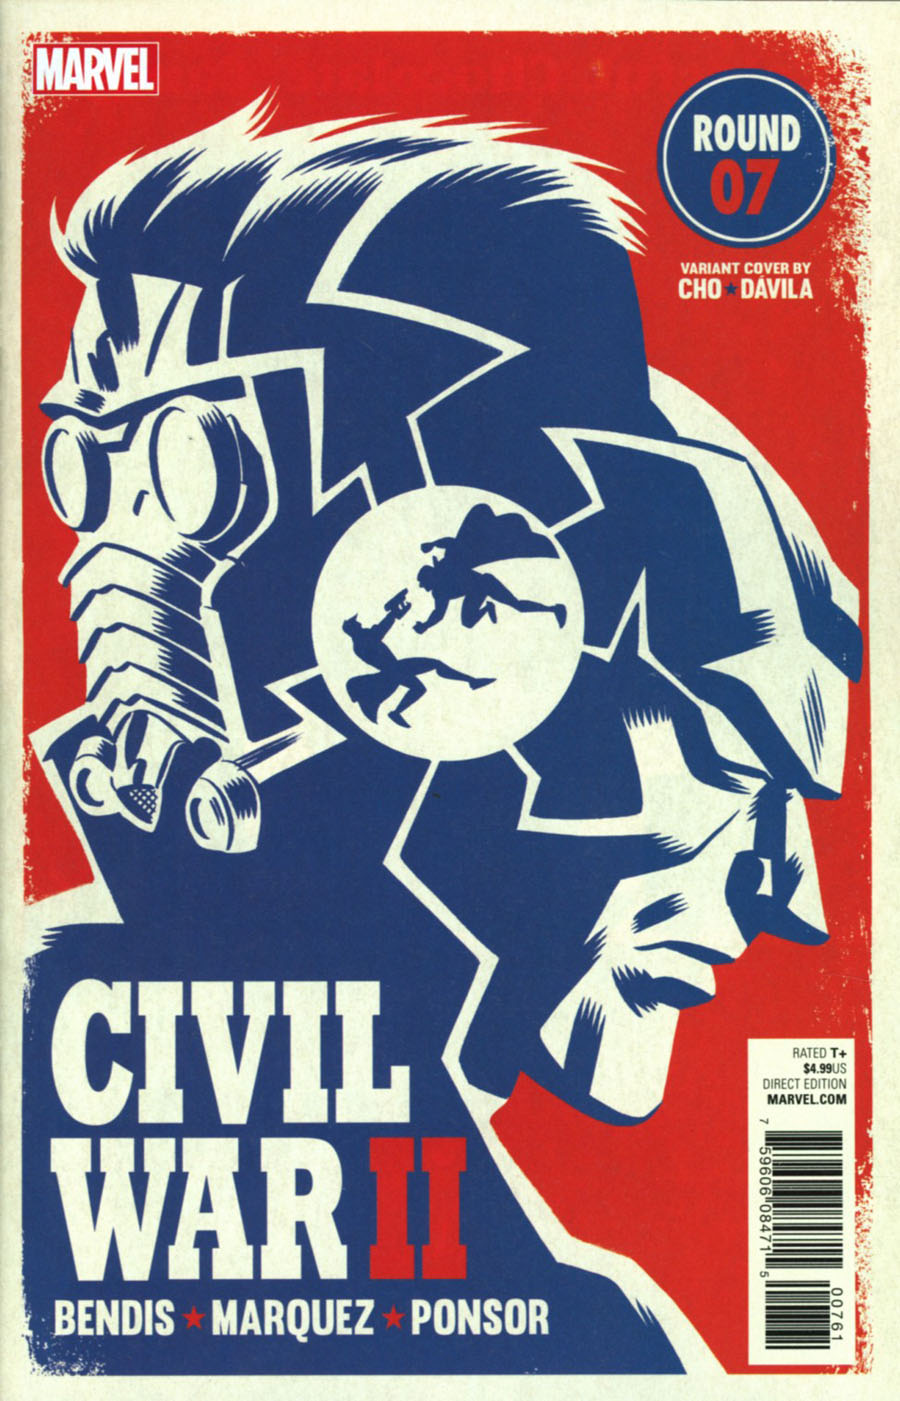 Civil War II #7 Cover B Variant Michael Cho Cover